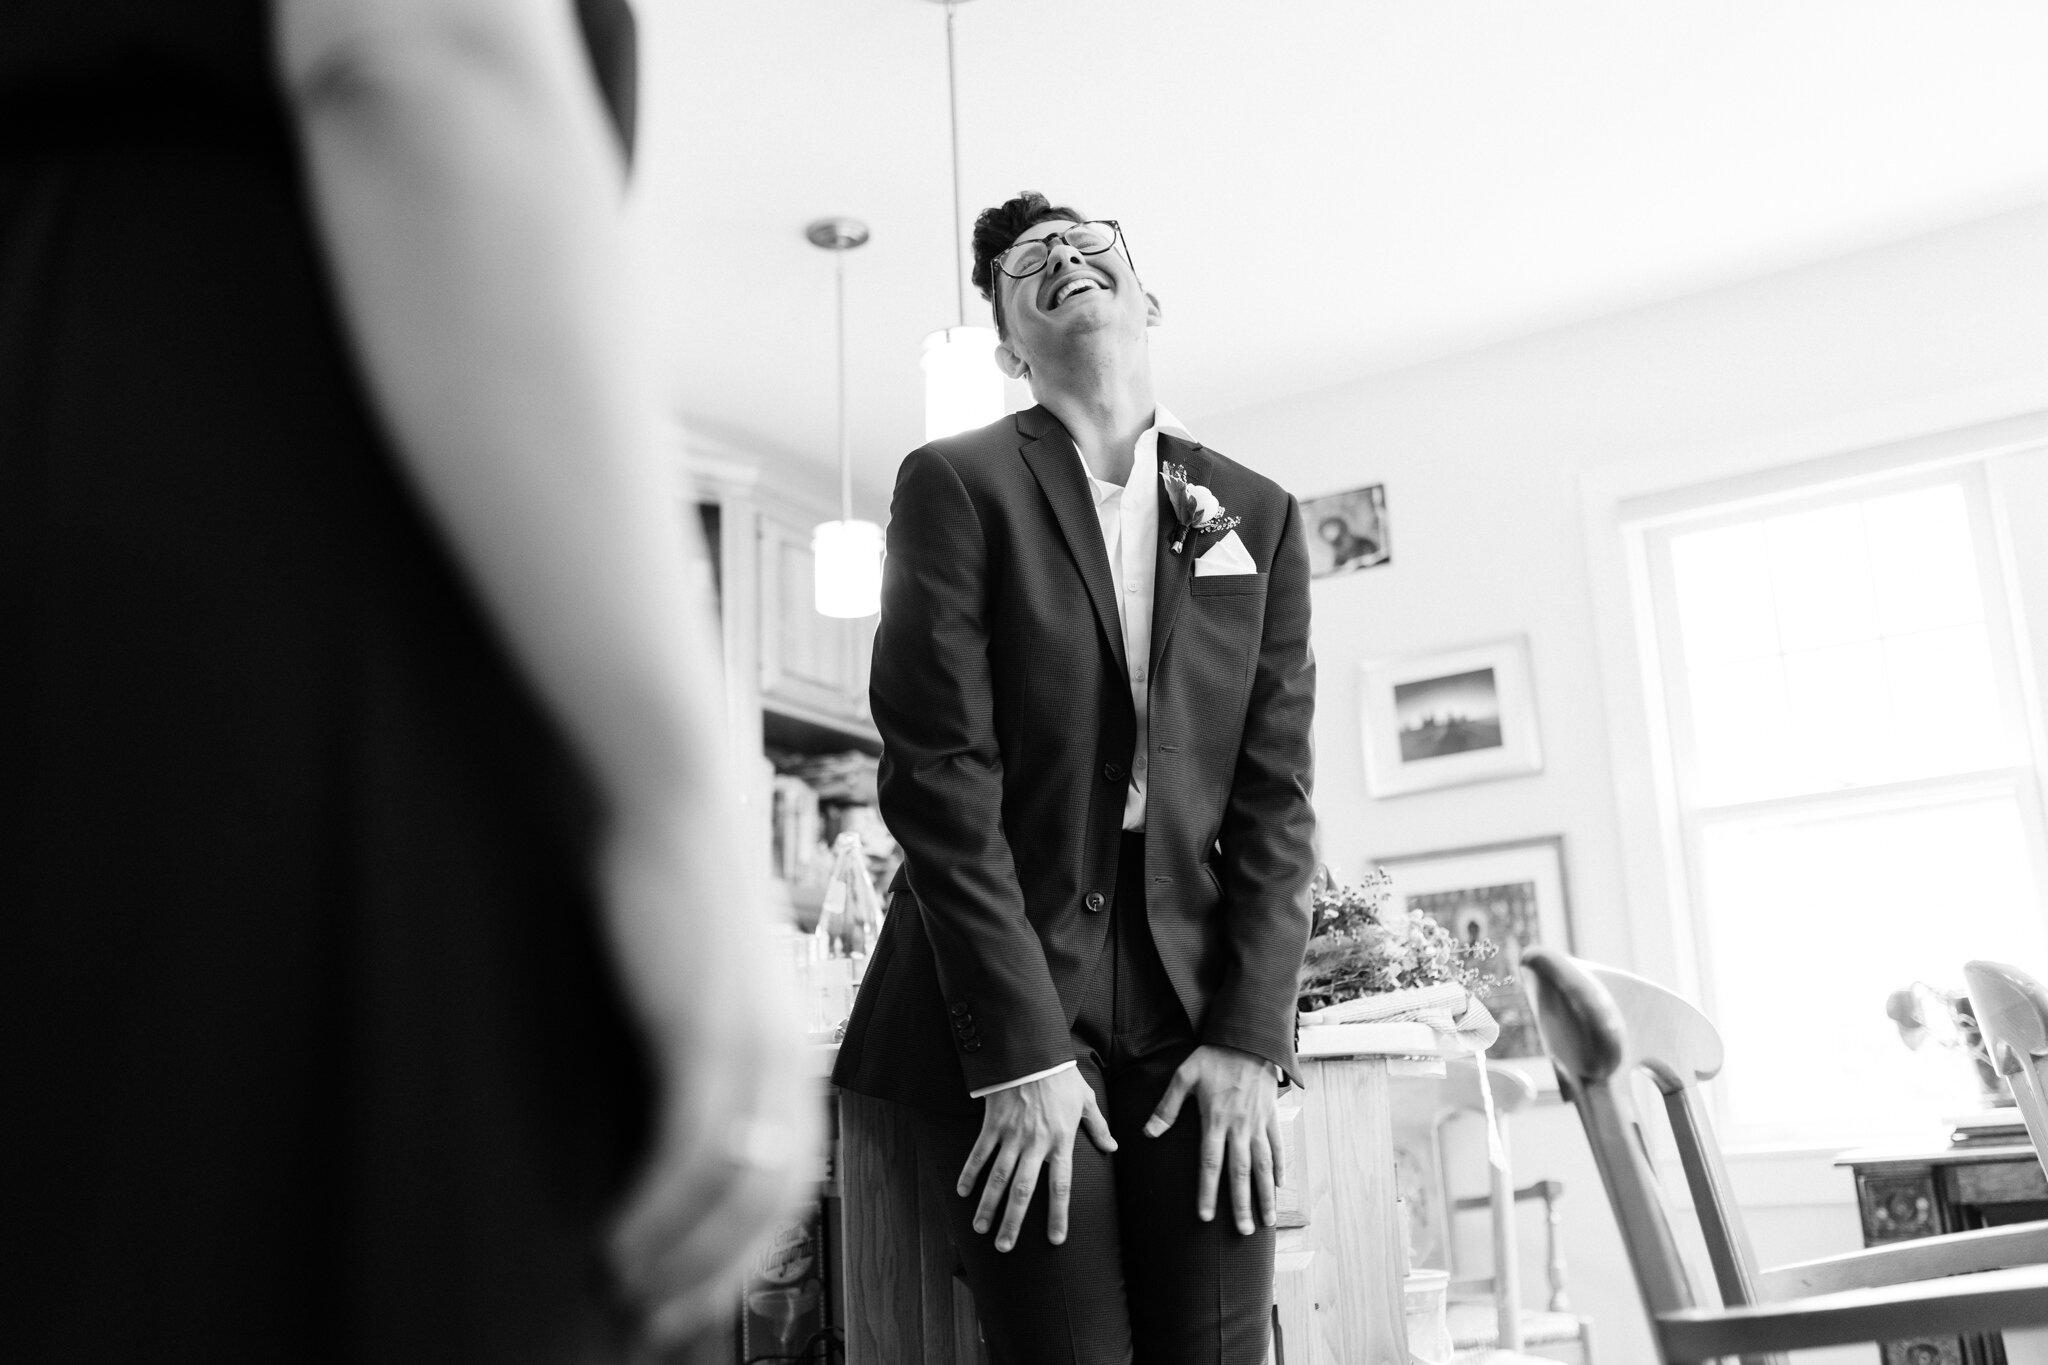 chicago-oak-park-wedding-rebeccaylasotras-6.jpg